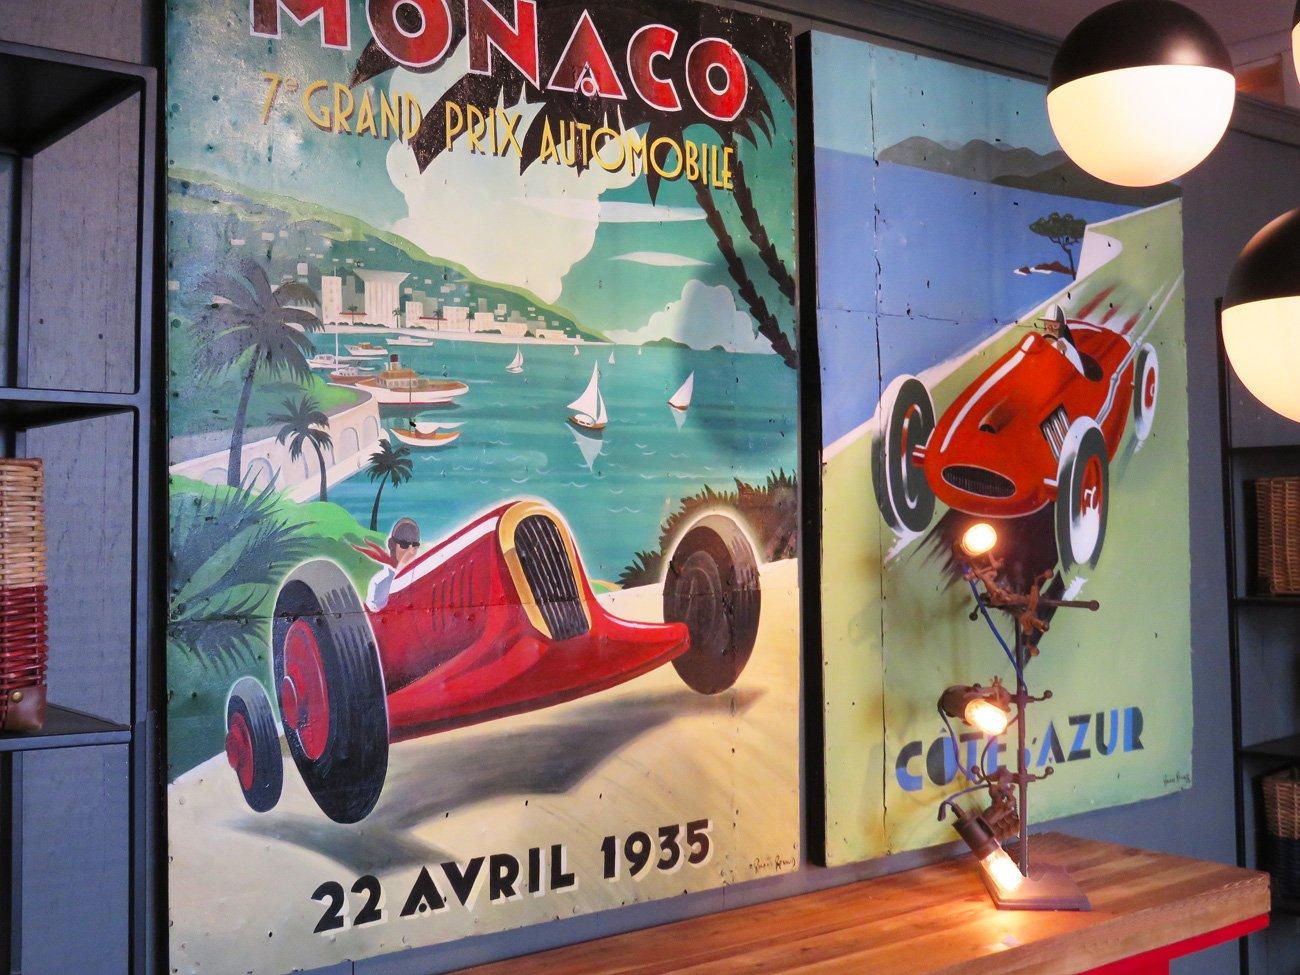 Monaco Grand Prix Wall Art